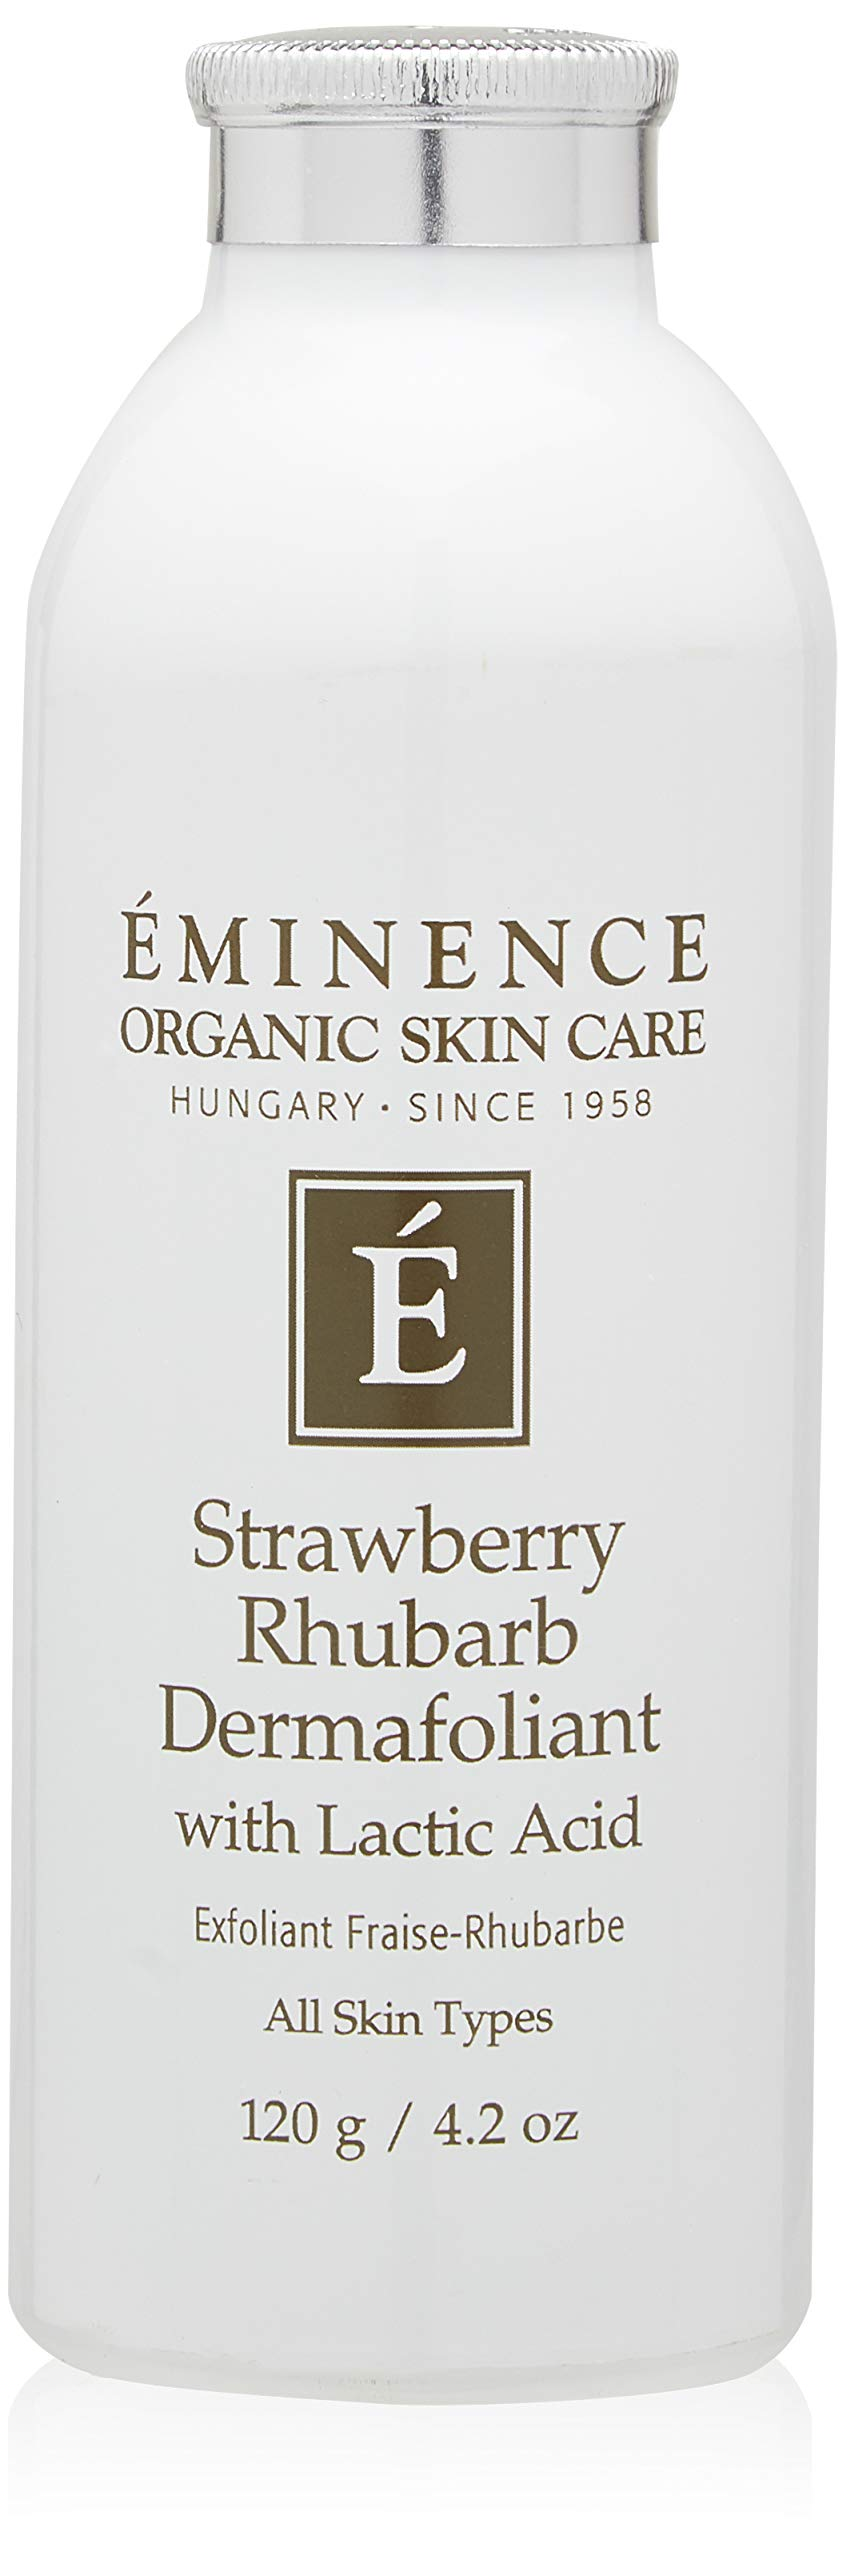 Eminence Strawberry Rhubarb Dermafoliant, 4.2 Ounce